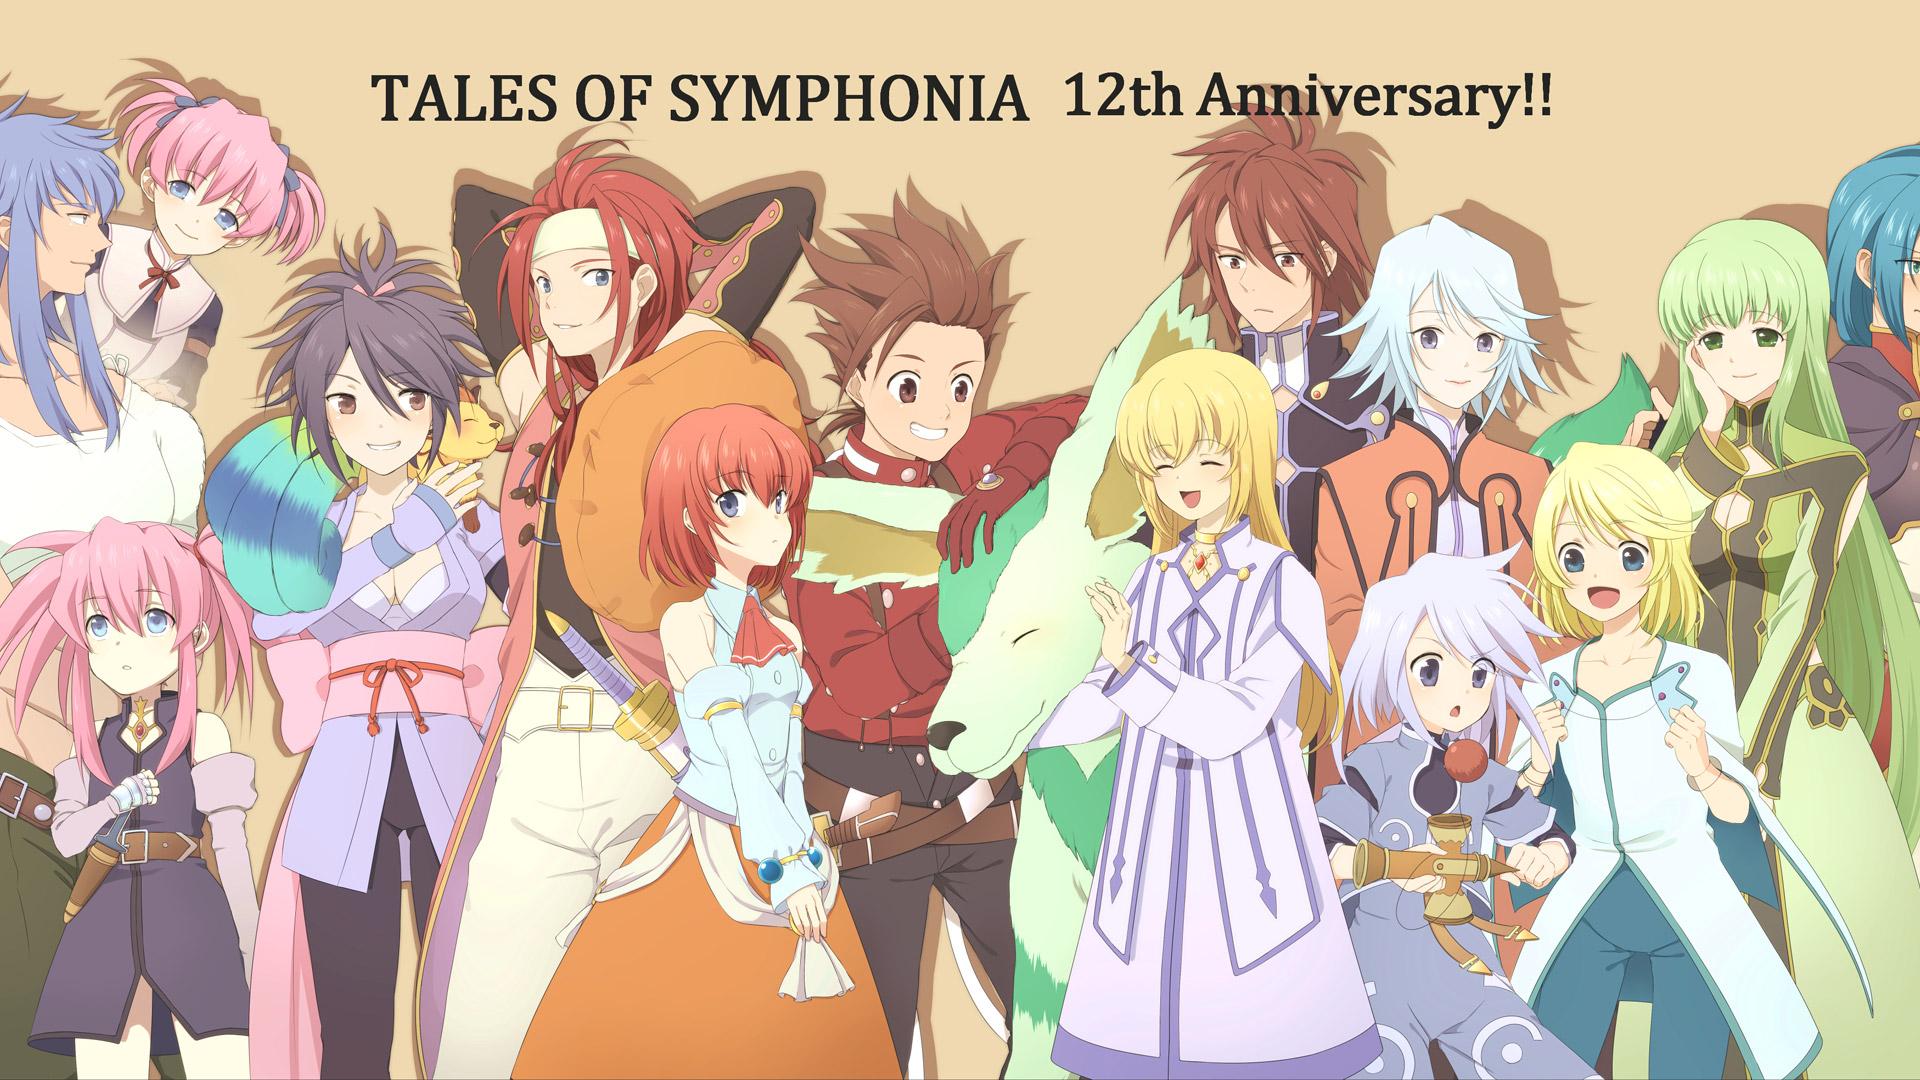 Free Tales of Symphonia Wallpaper in 1920x1080